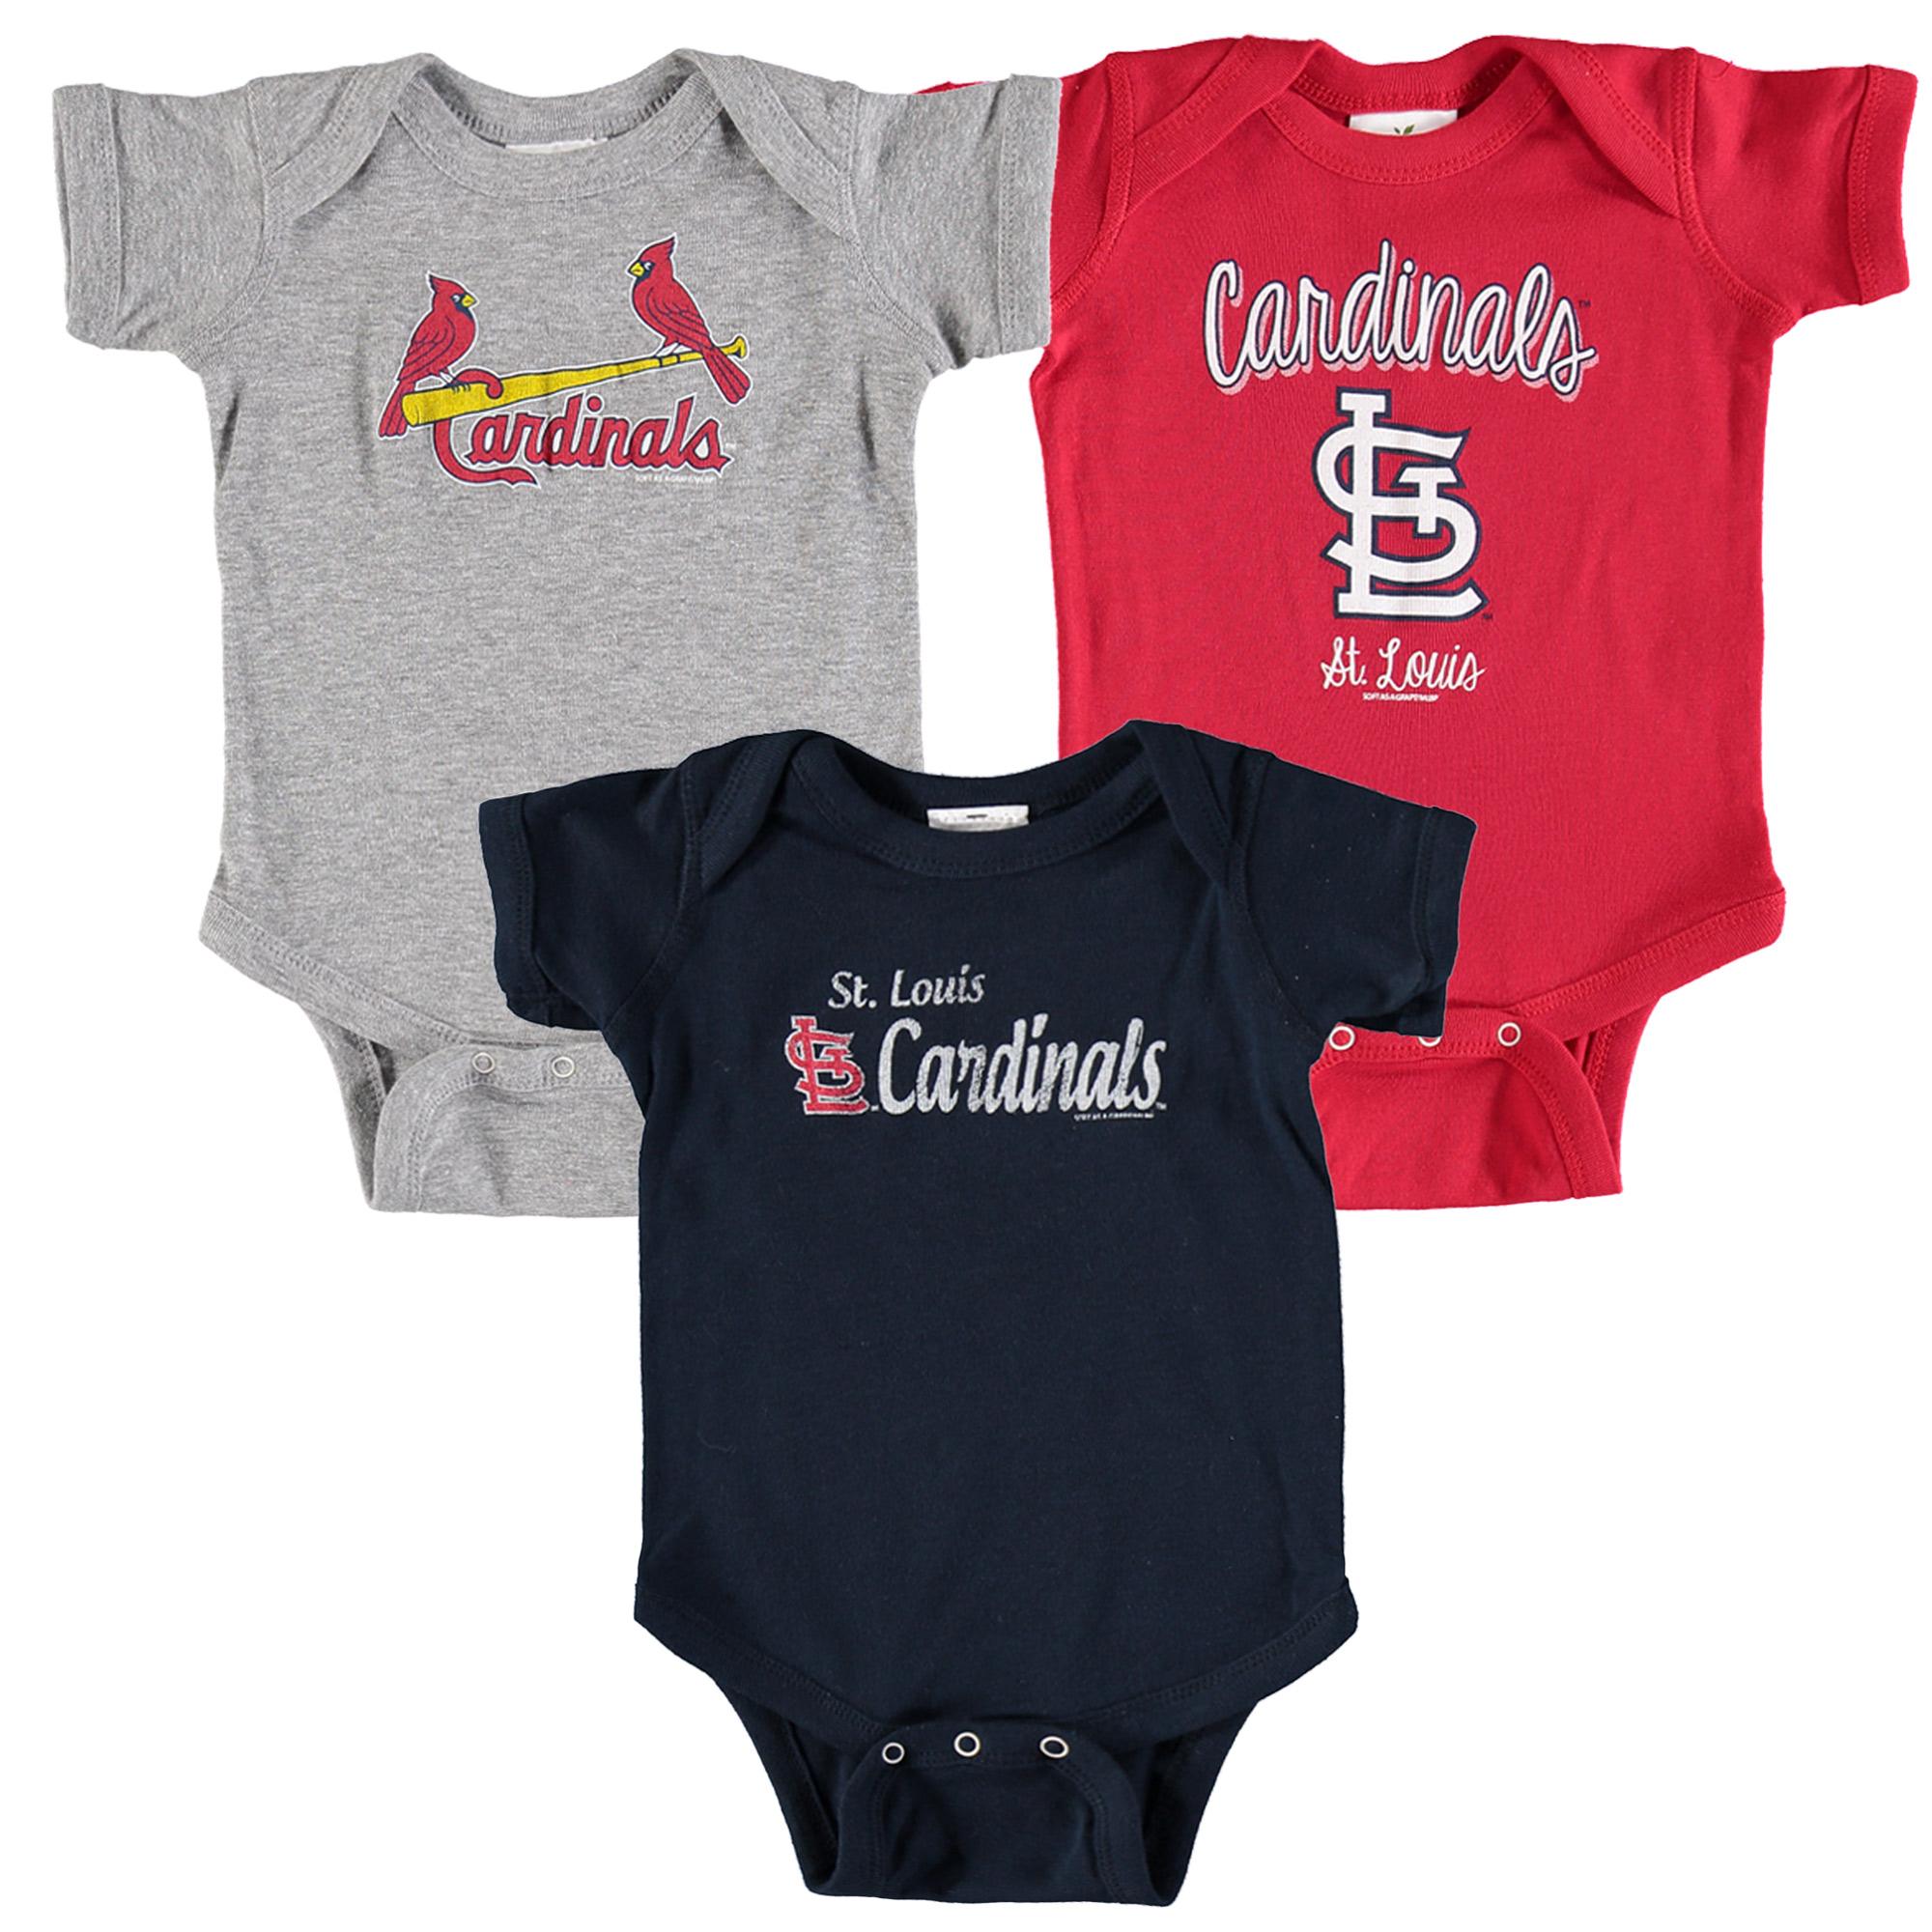 St. Louis Cardinals Soft as a Grape Infant 3-Pack Rookie Bodysuit Set - Red